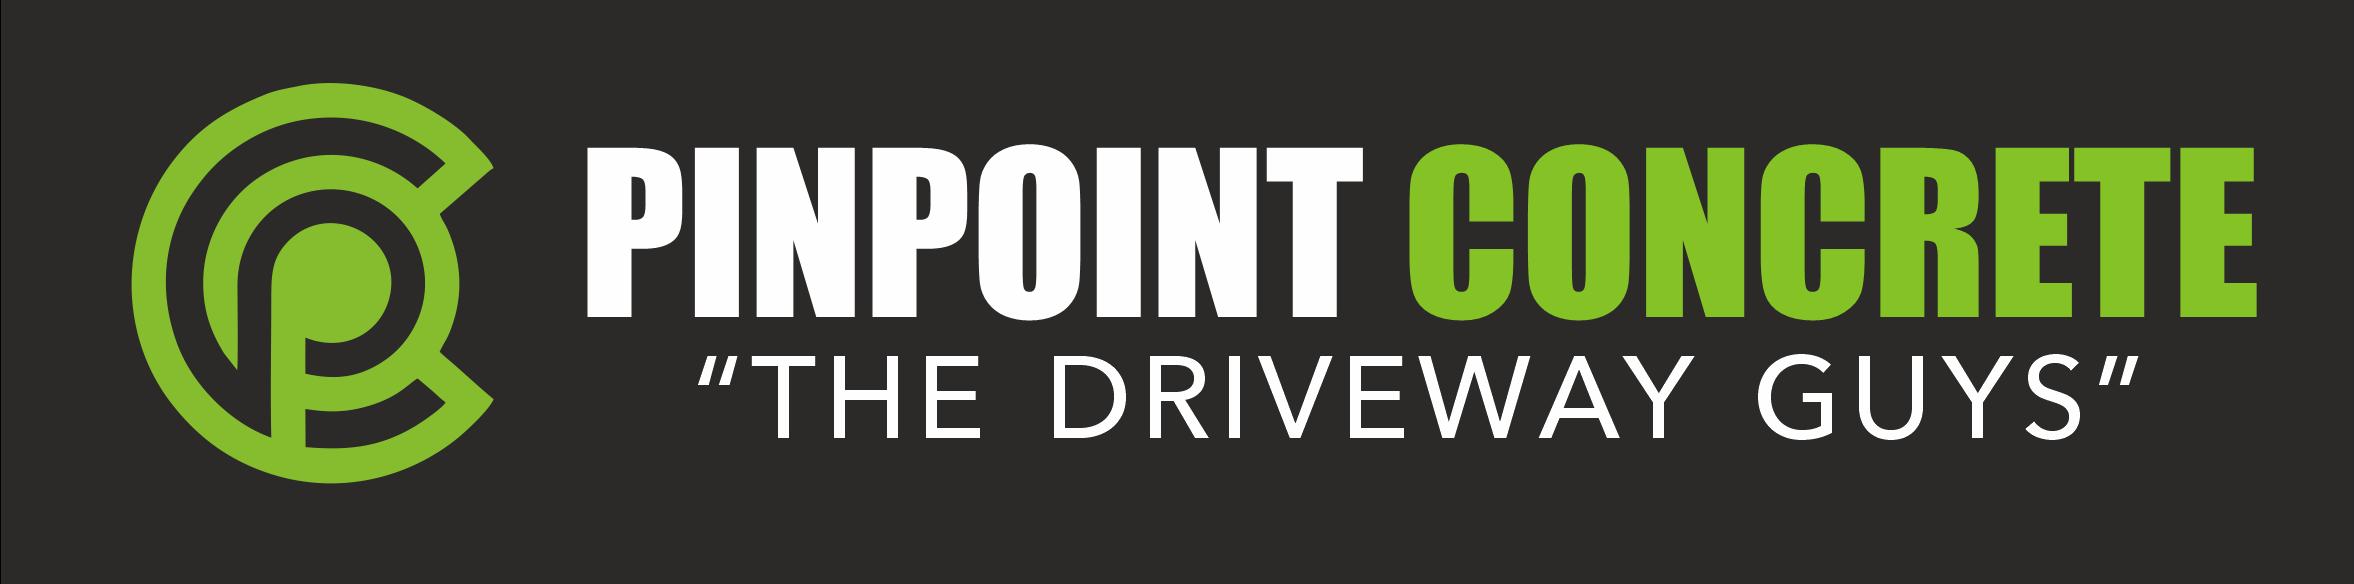 Pinpoint Concrete Logo